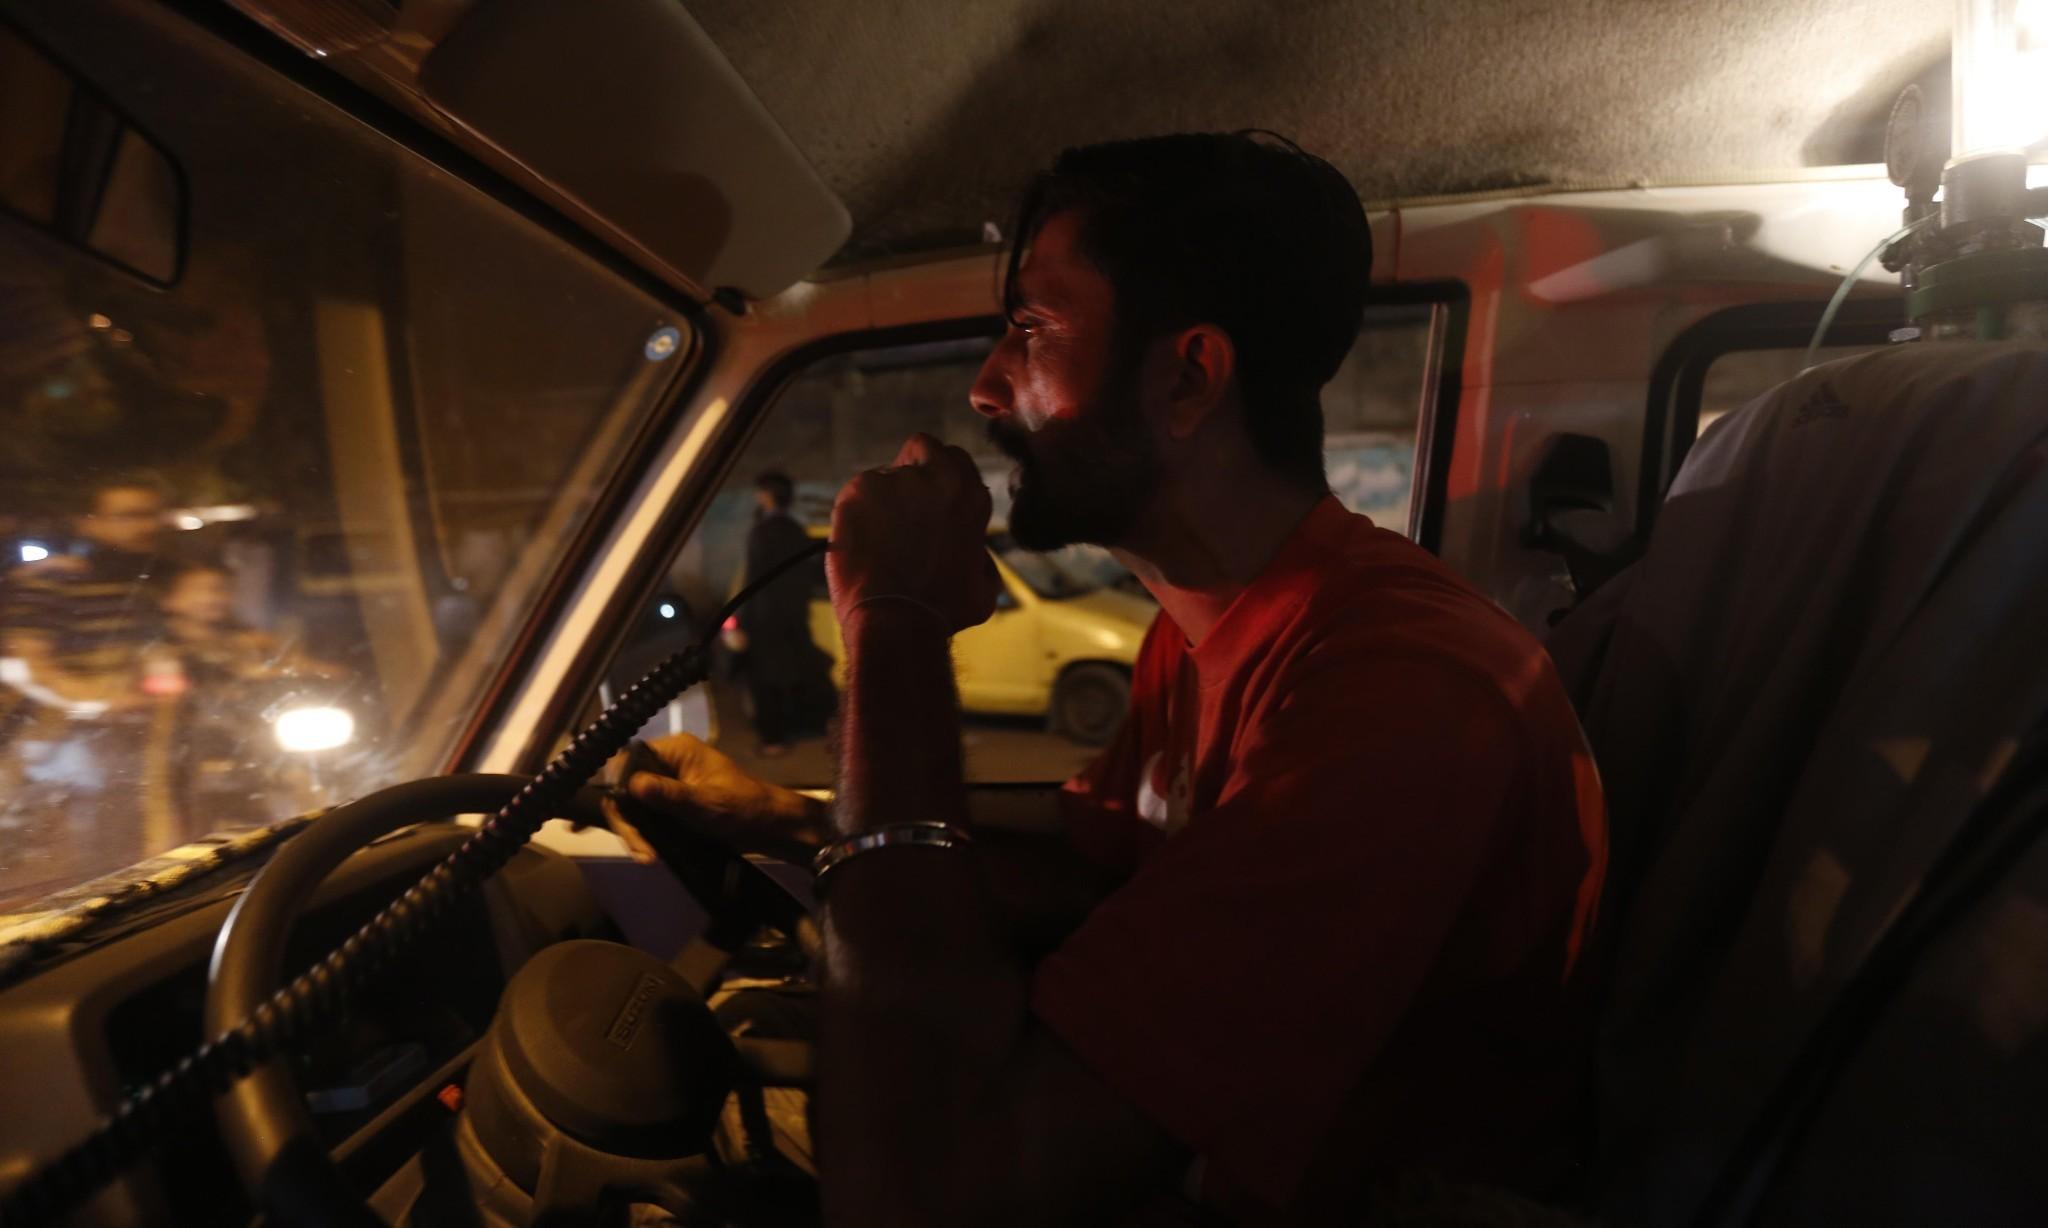 On the frontline with Karachi's ambulance drivers